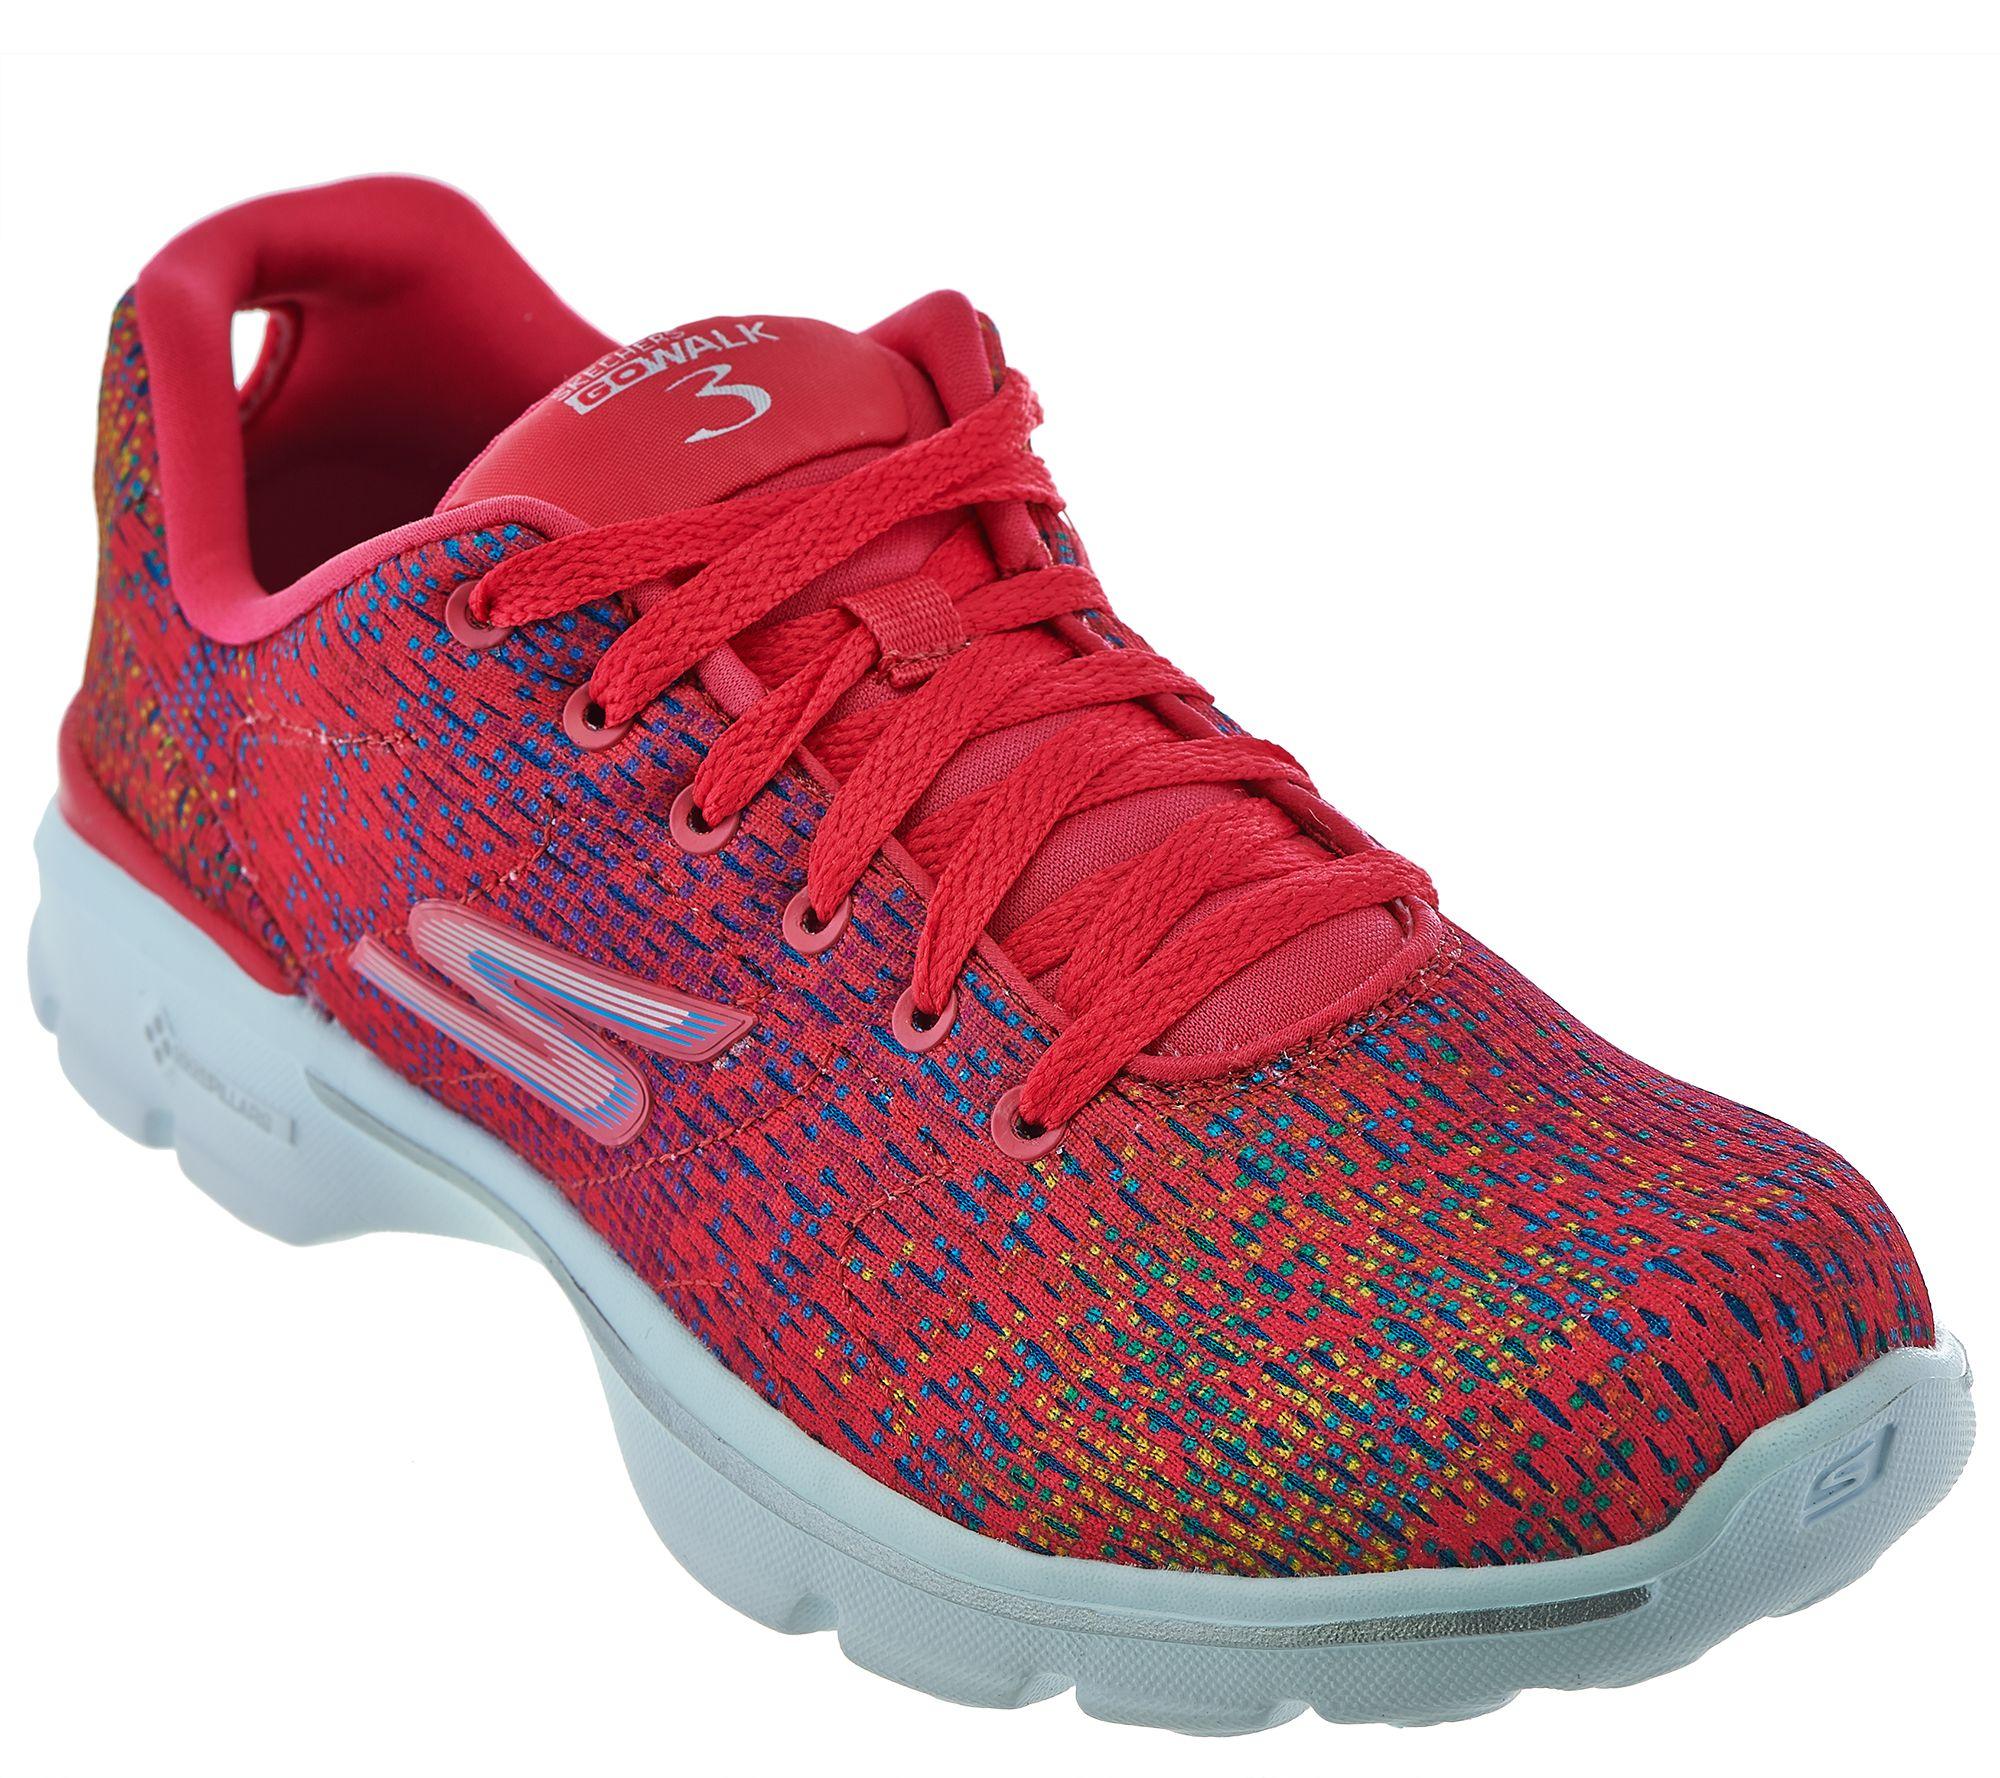 Qvc Nike Shoes